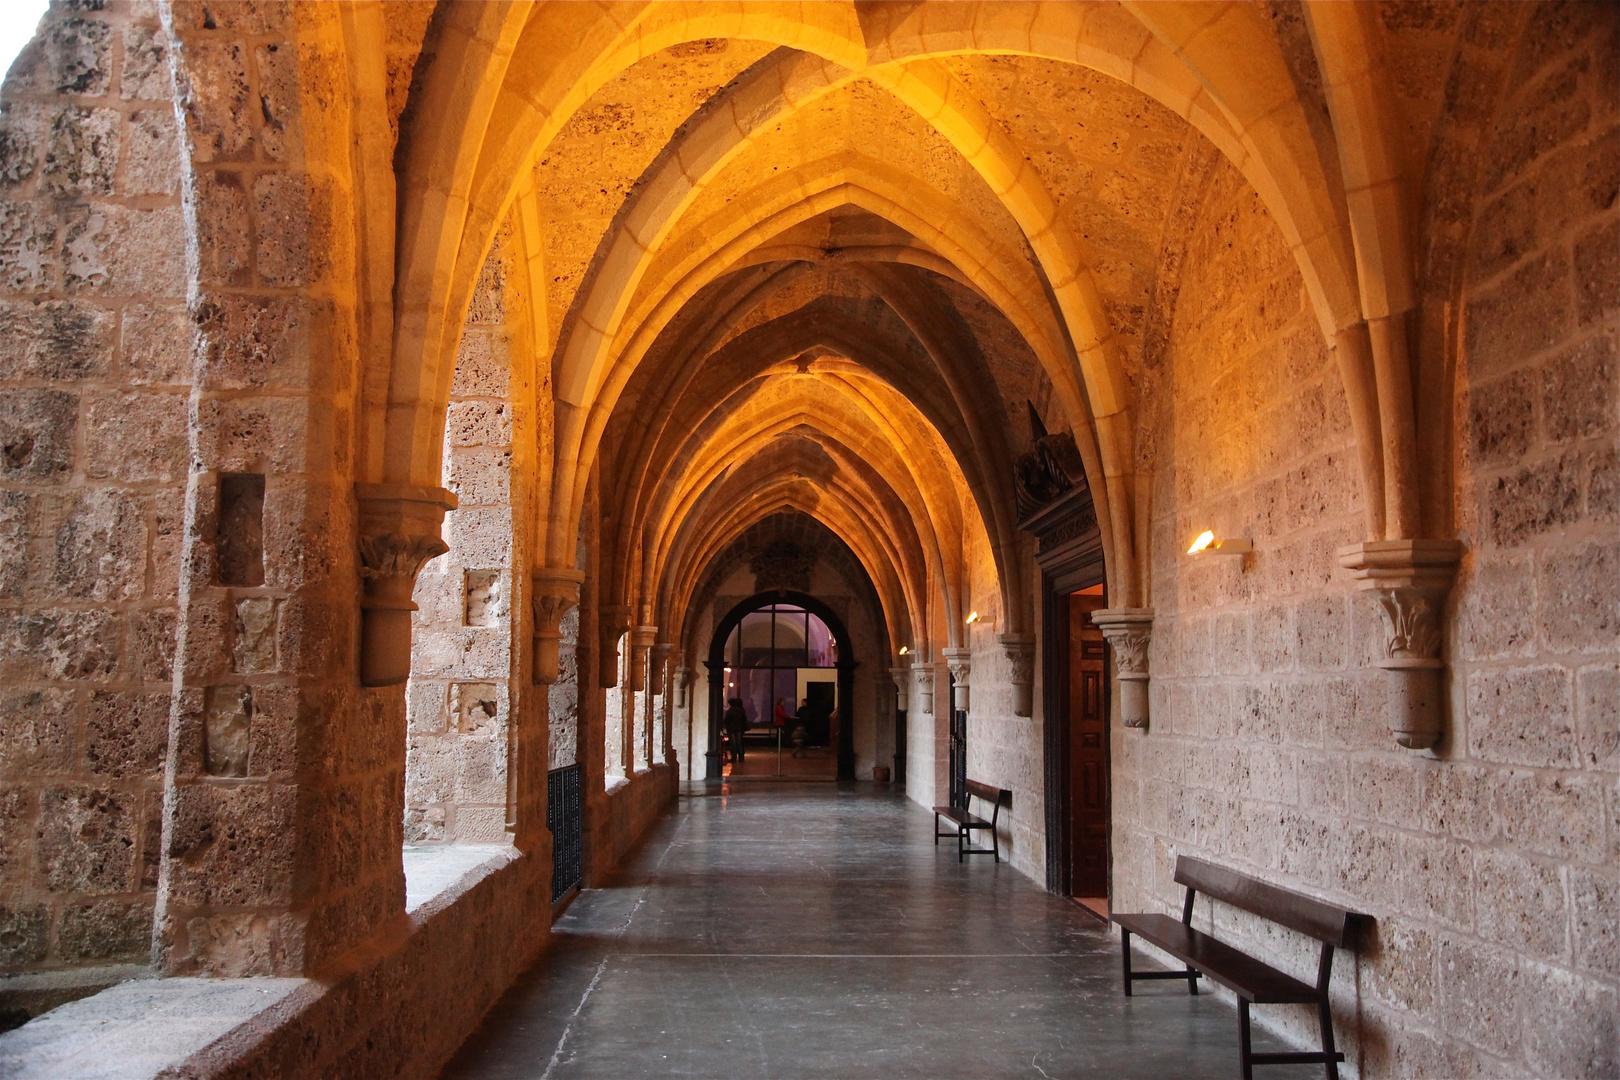 Monasterio de Piedra II